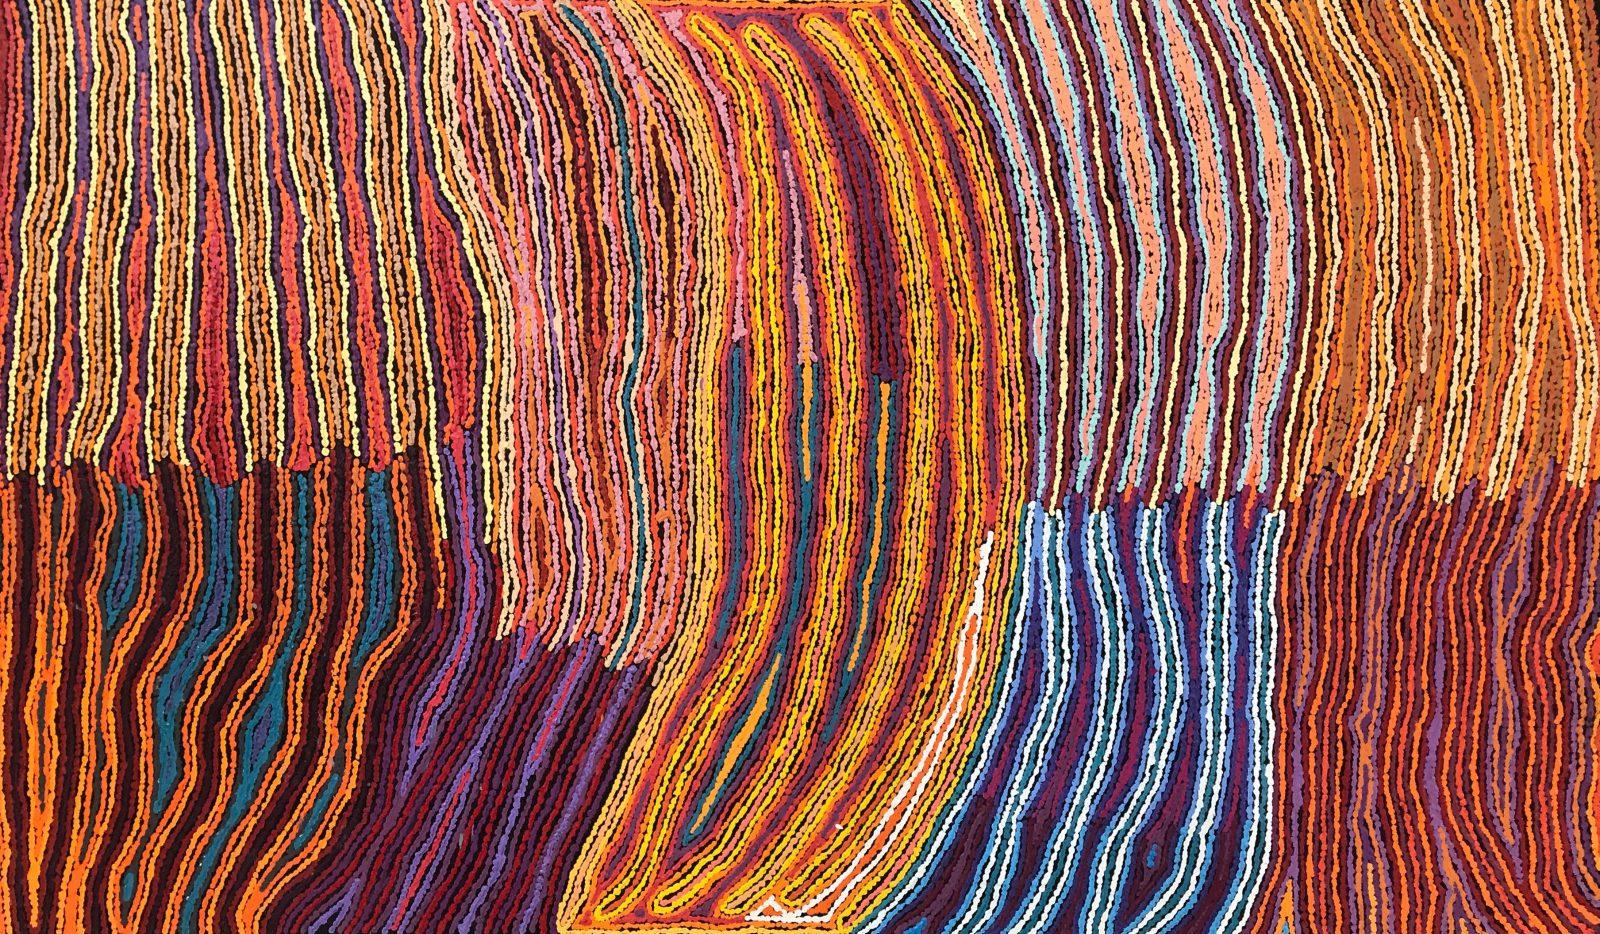 Christine Napanangka Michaels Lappi Lappi Dreaming, 2019, acrylic on canvas, 183 x 107cm